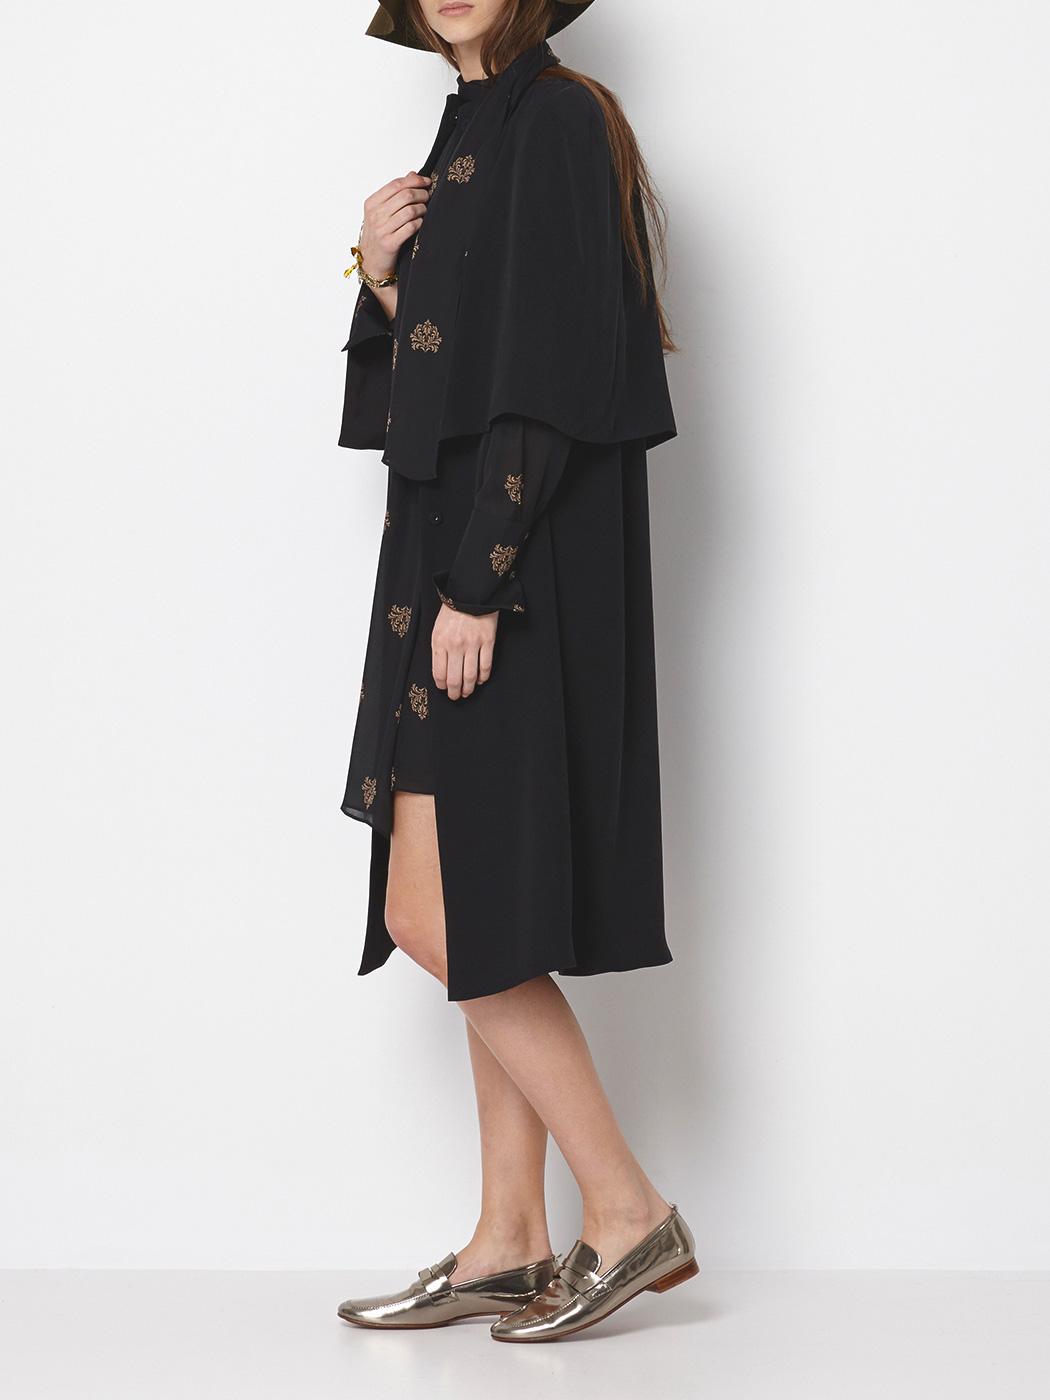 abrigo estilo capa 145€ intr